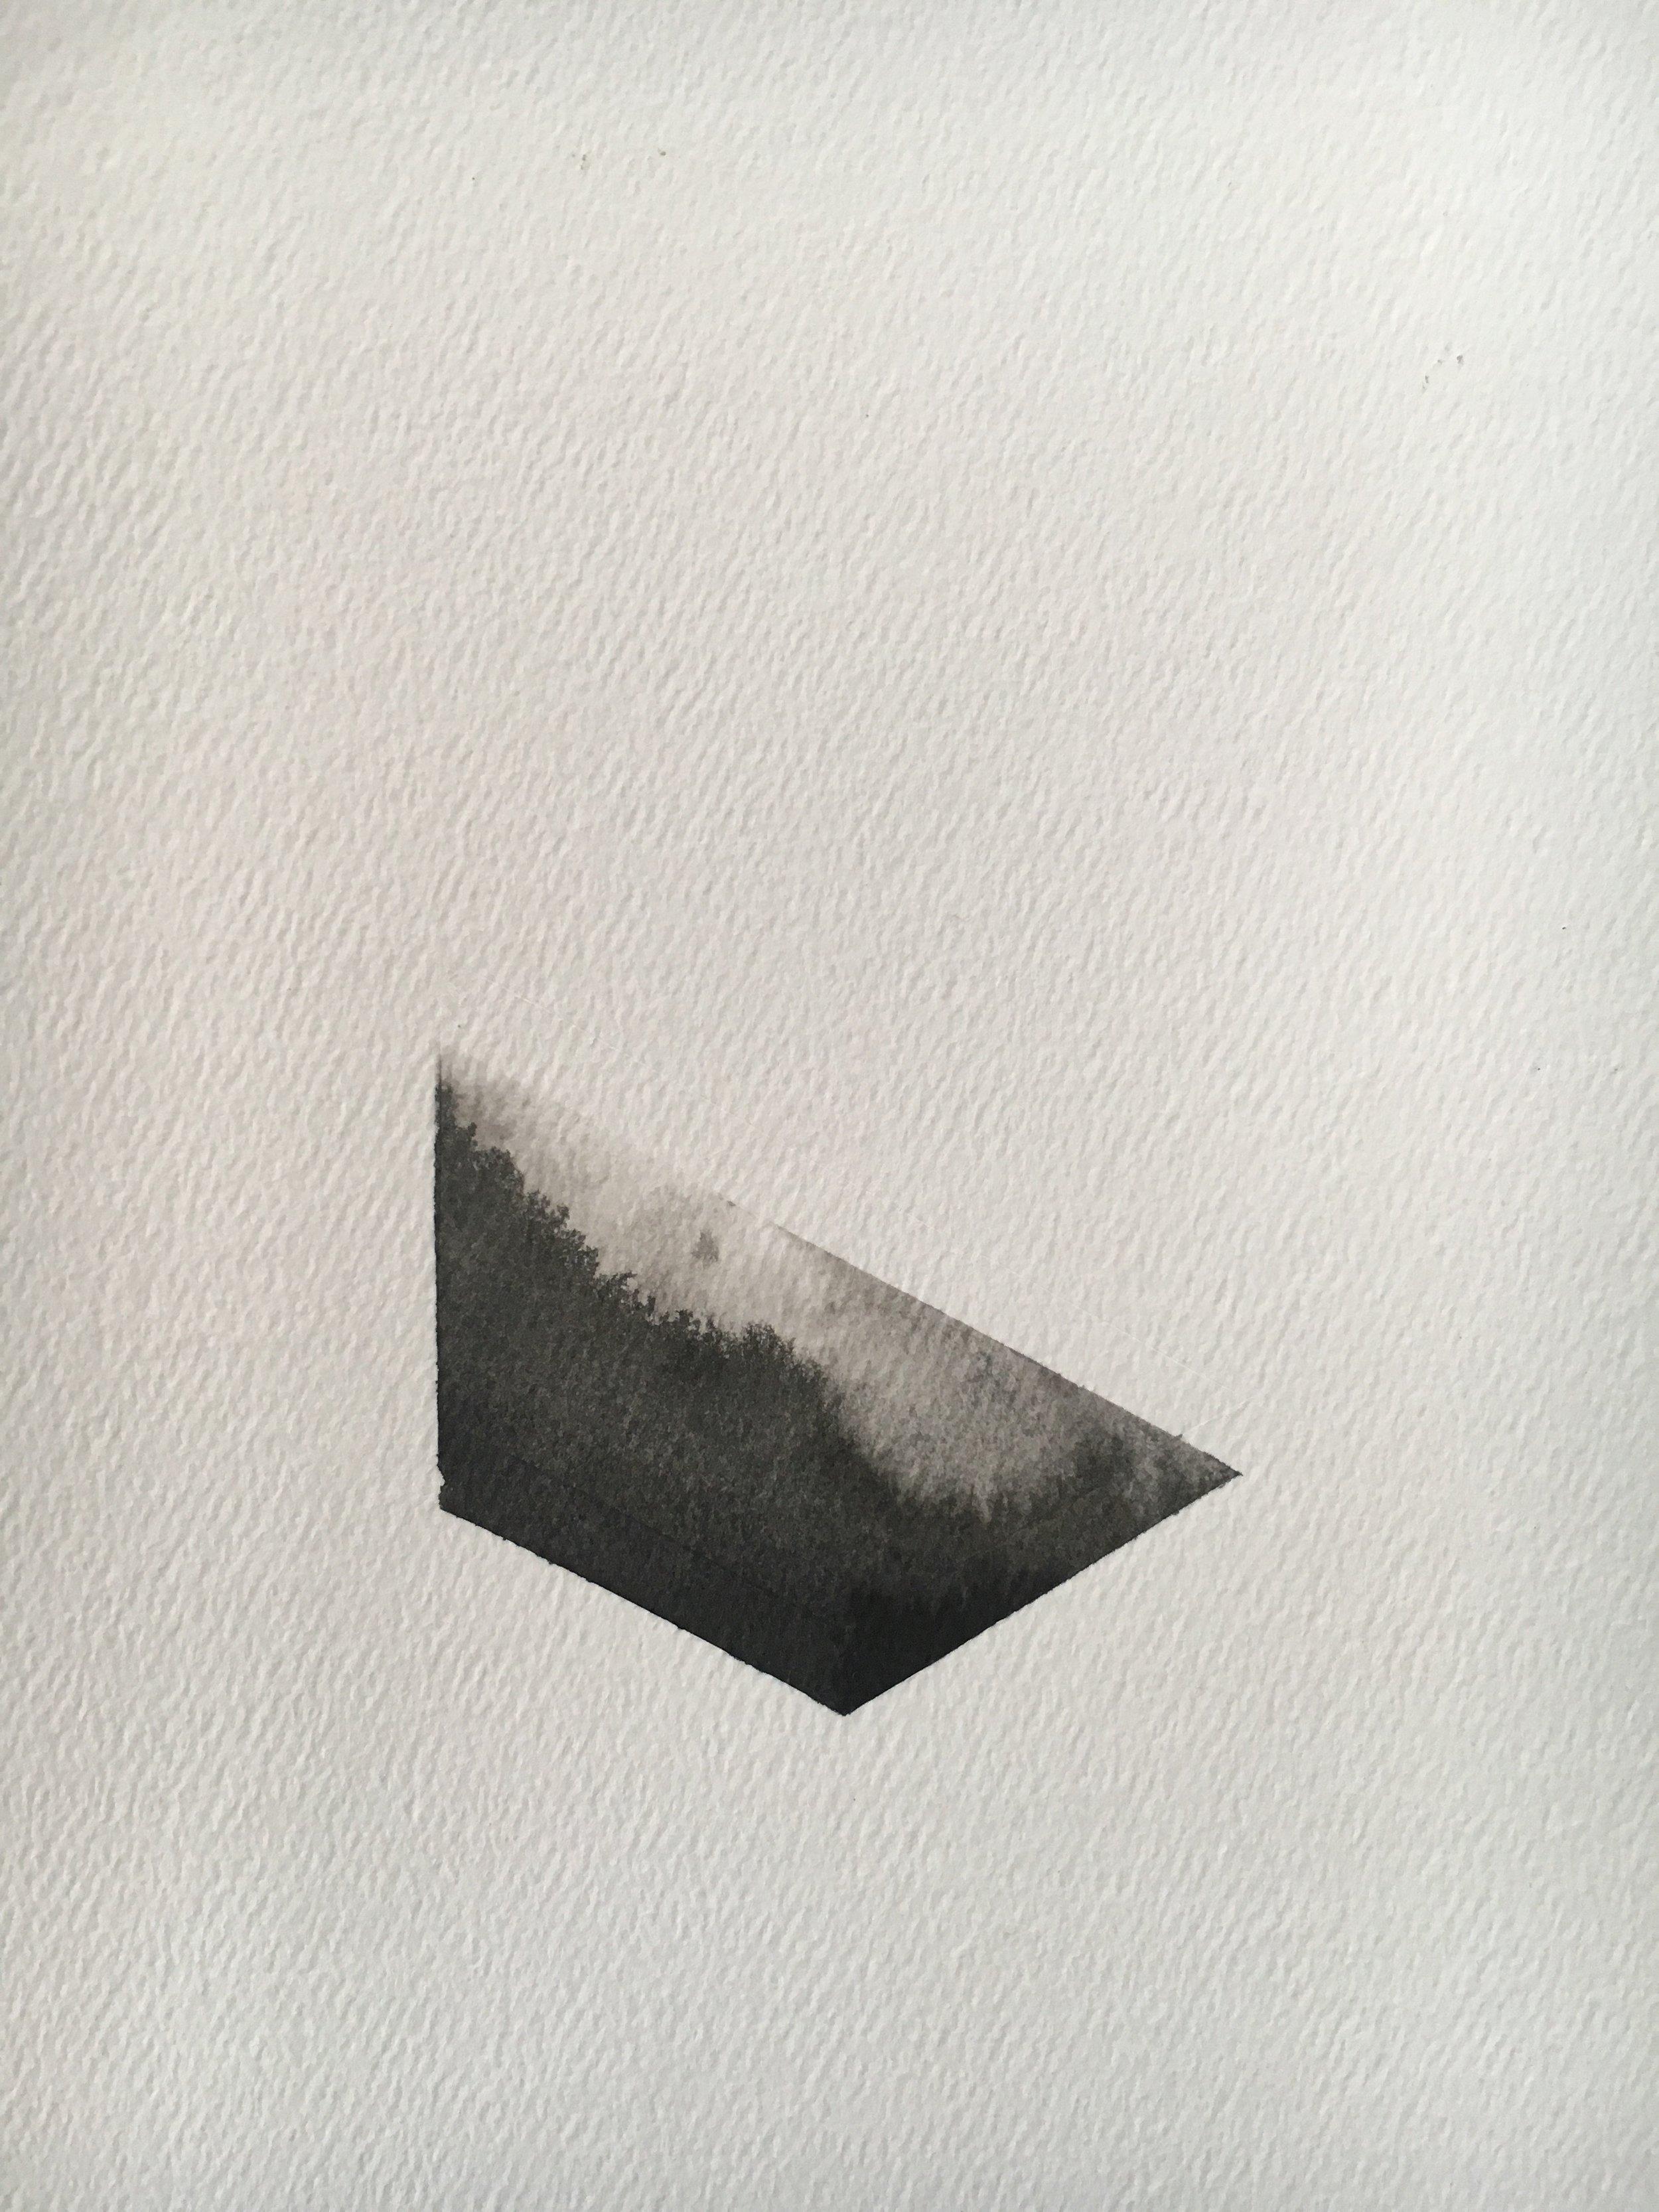 Book sketch 6.jpg